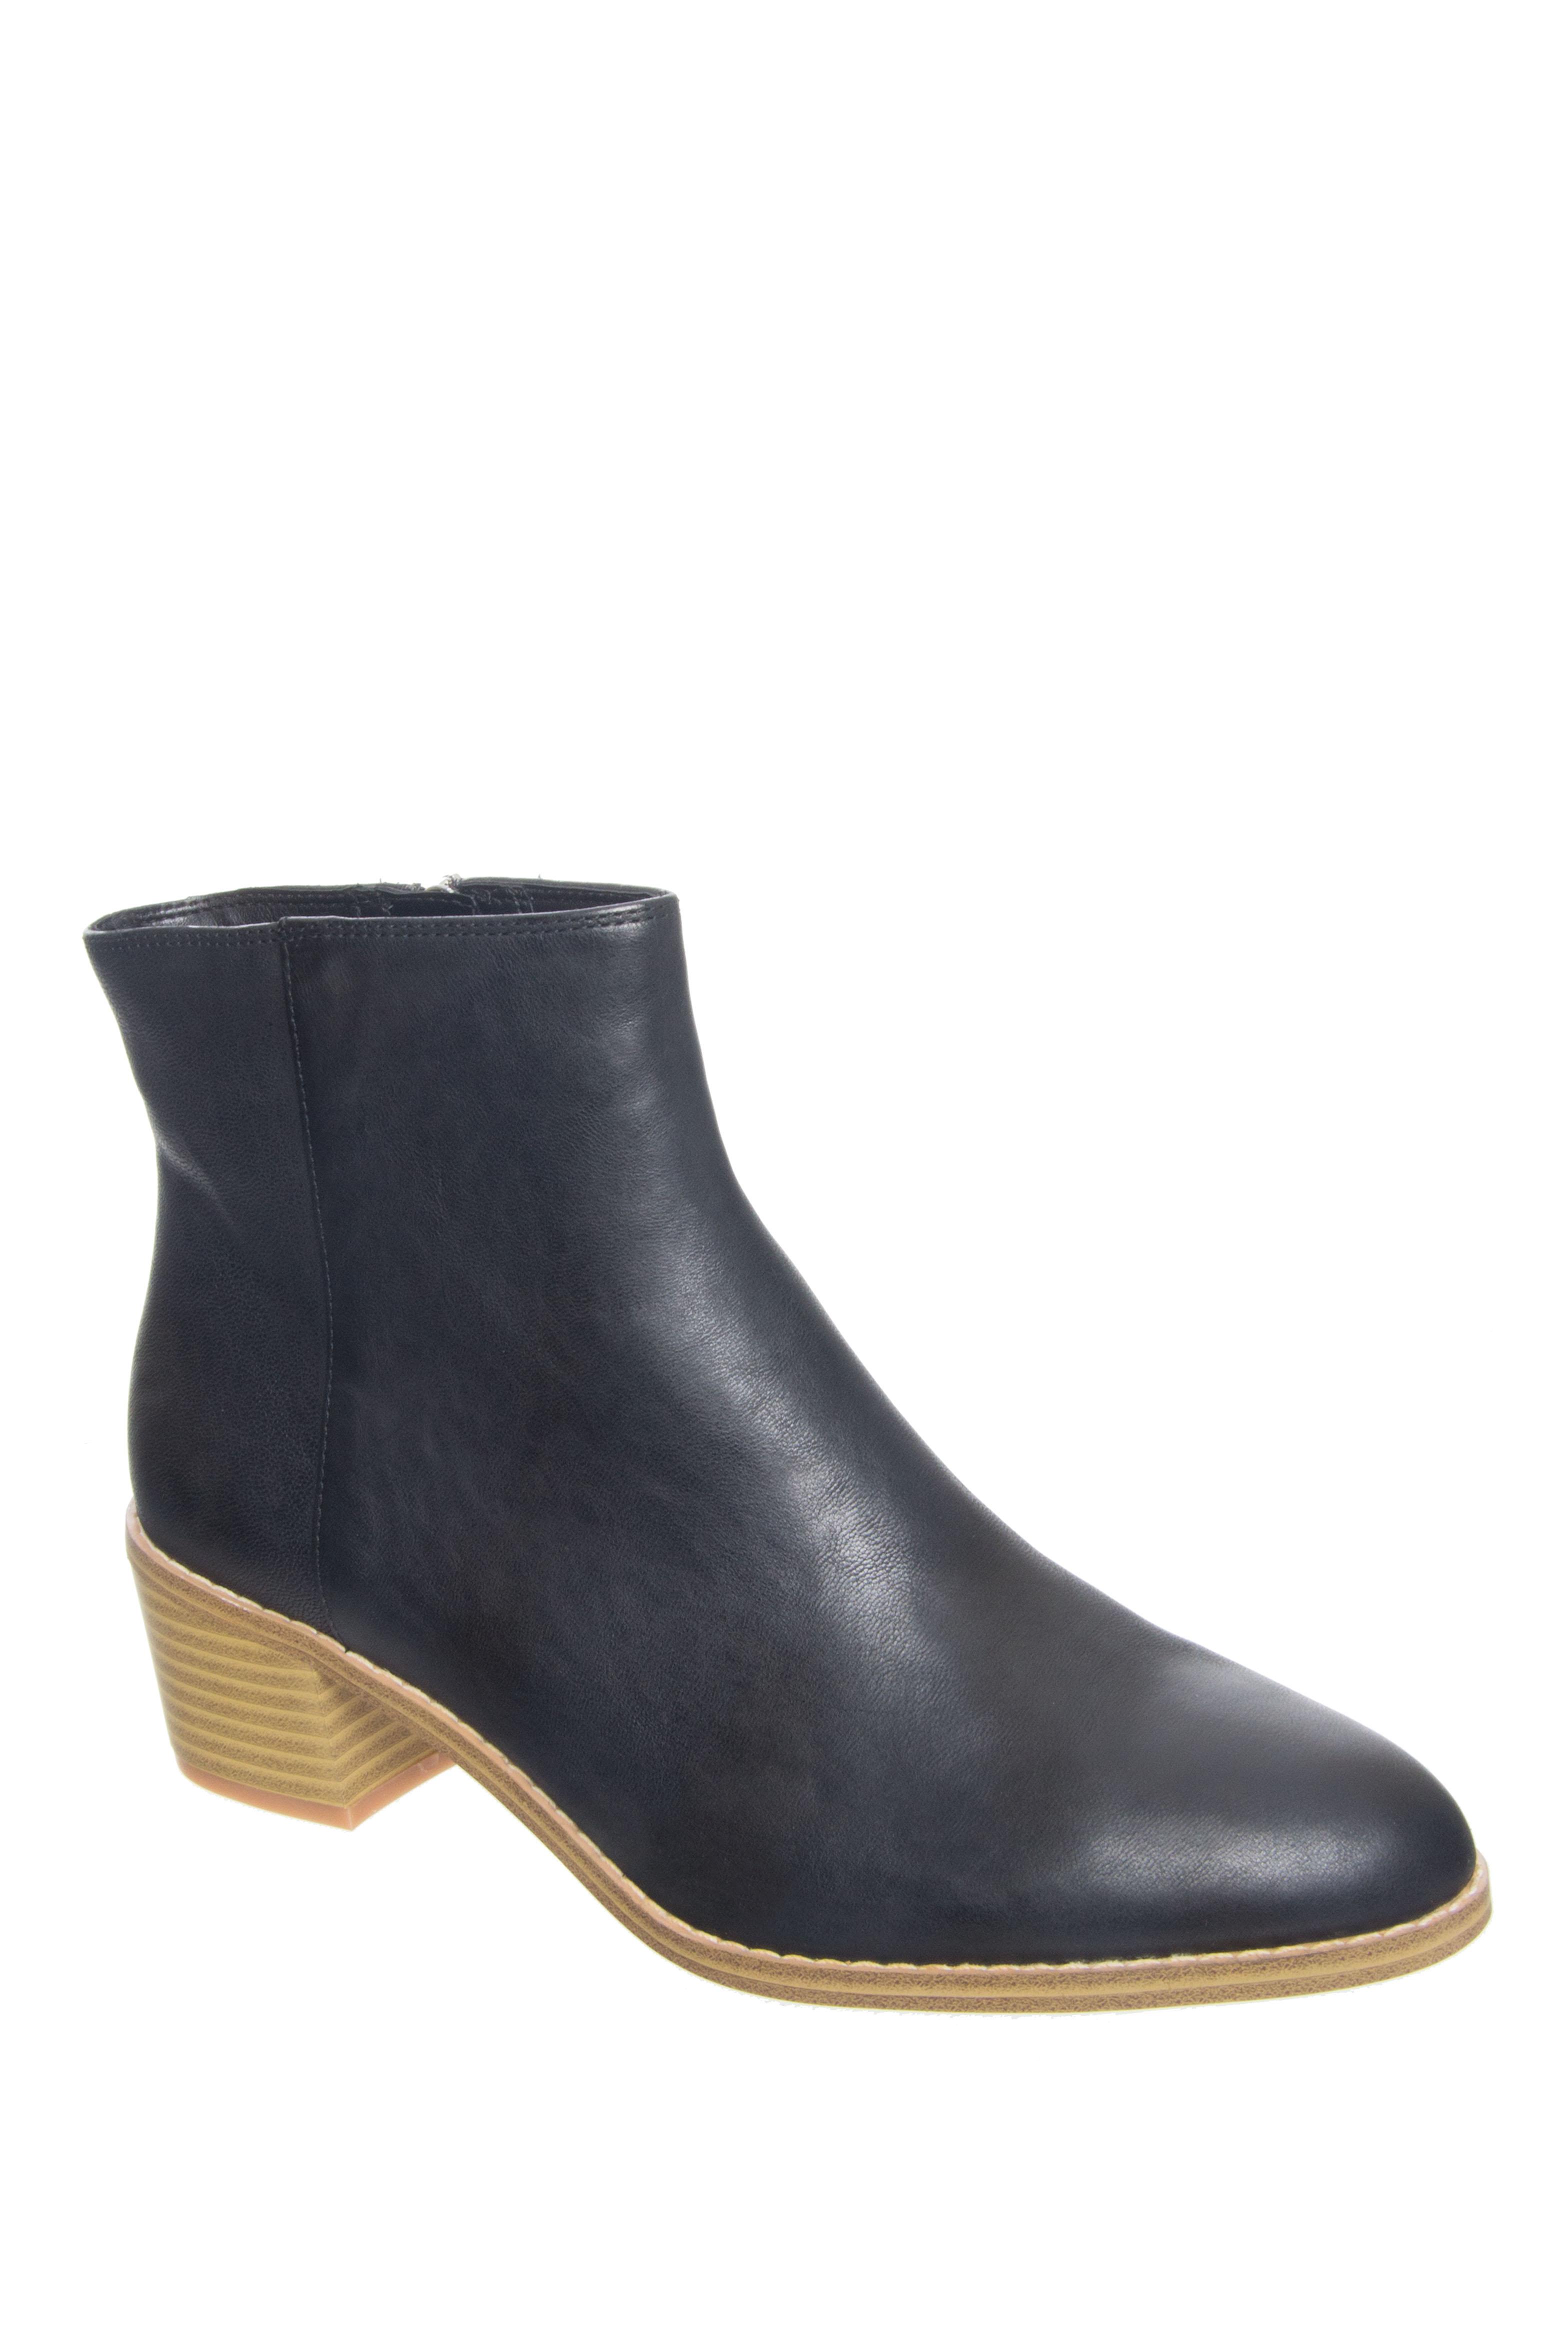 Clarks Breccan Myth Mid Heel Booties - Black